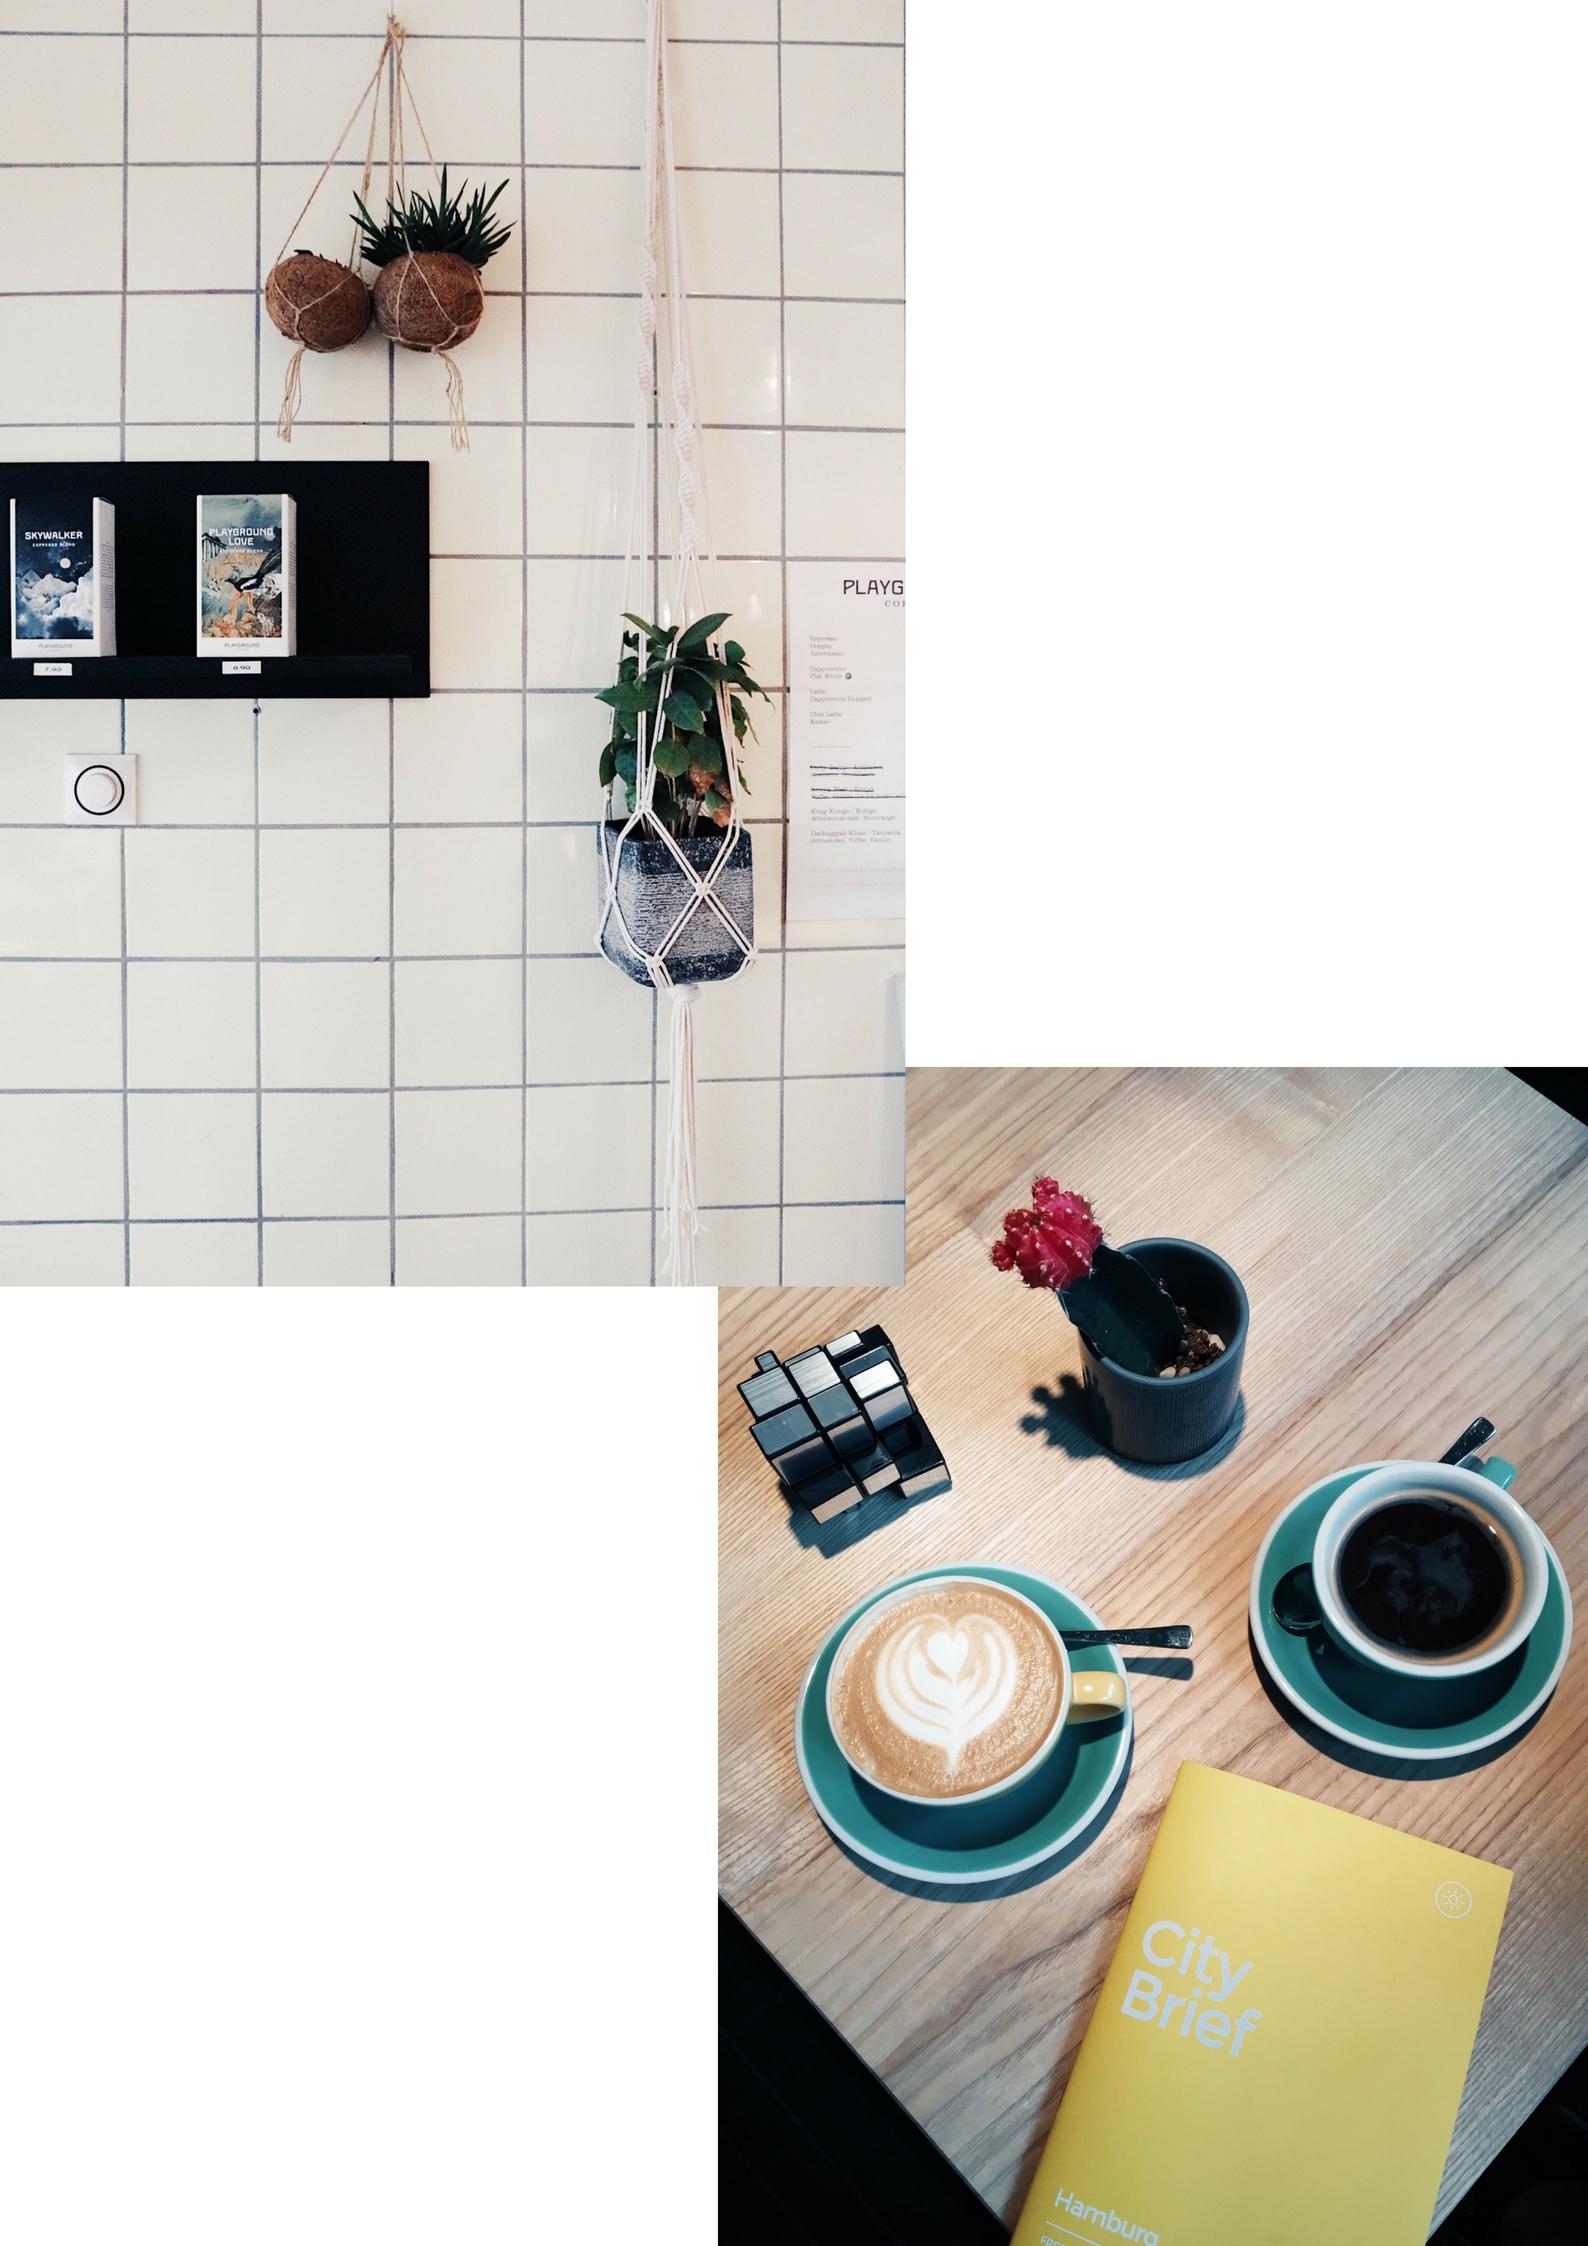 Playgroundcoffee2.jpg